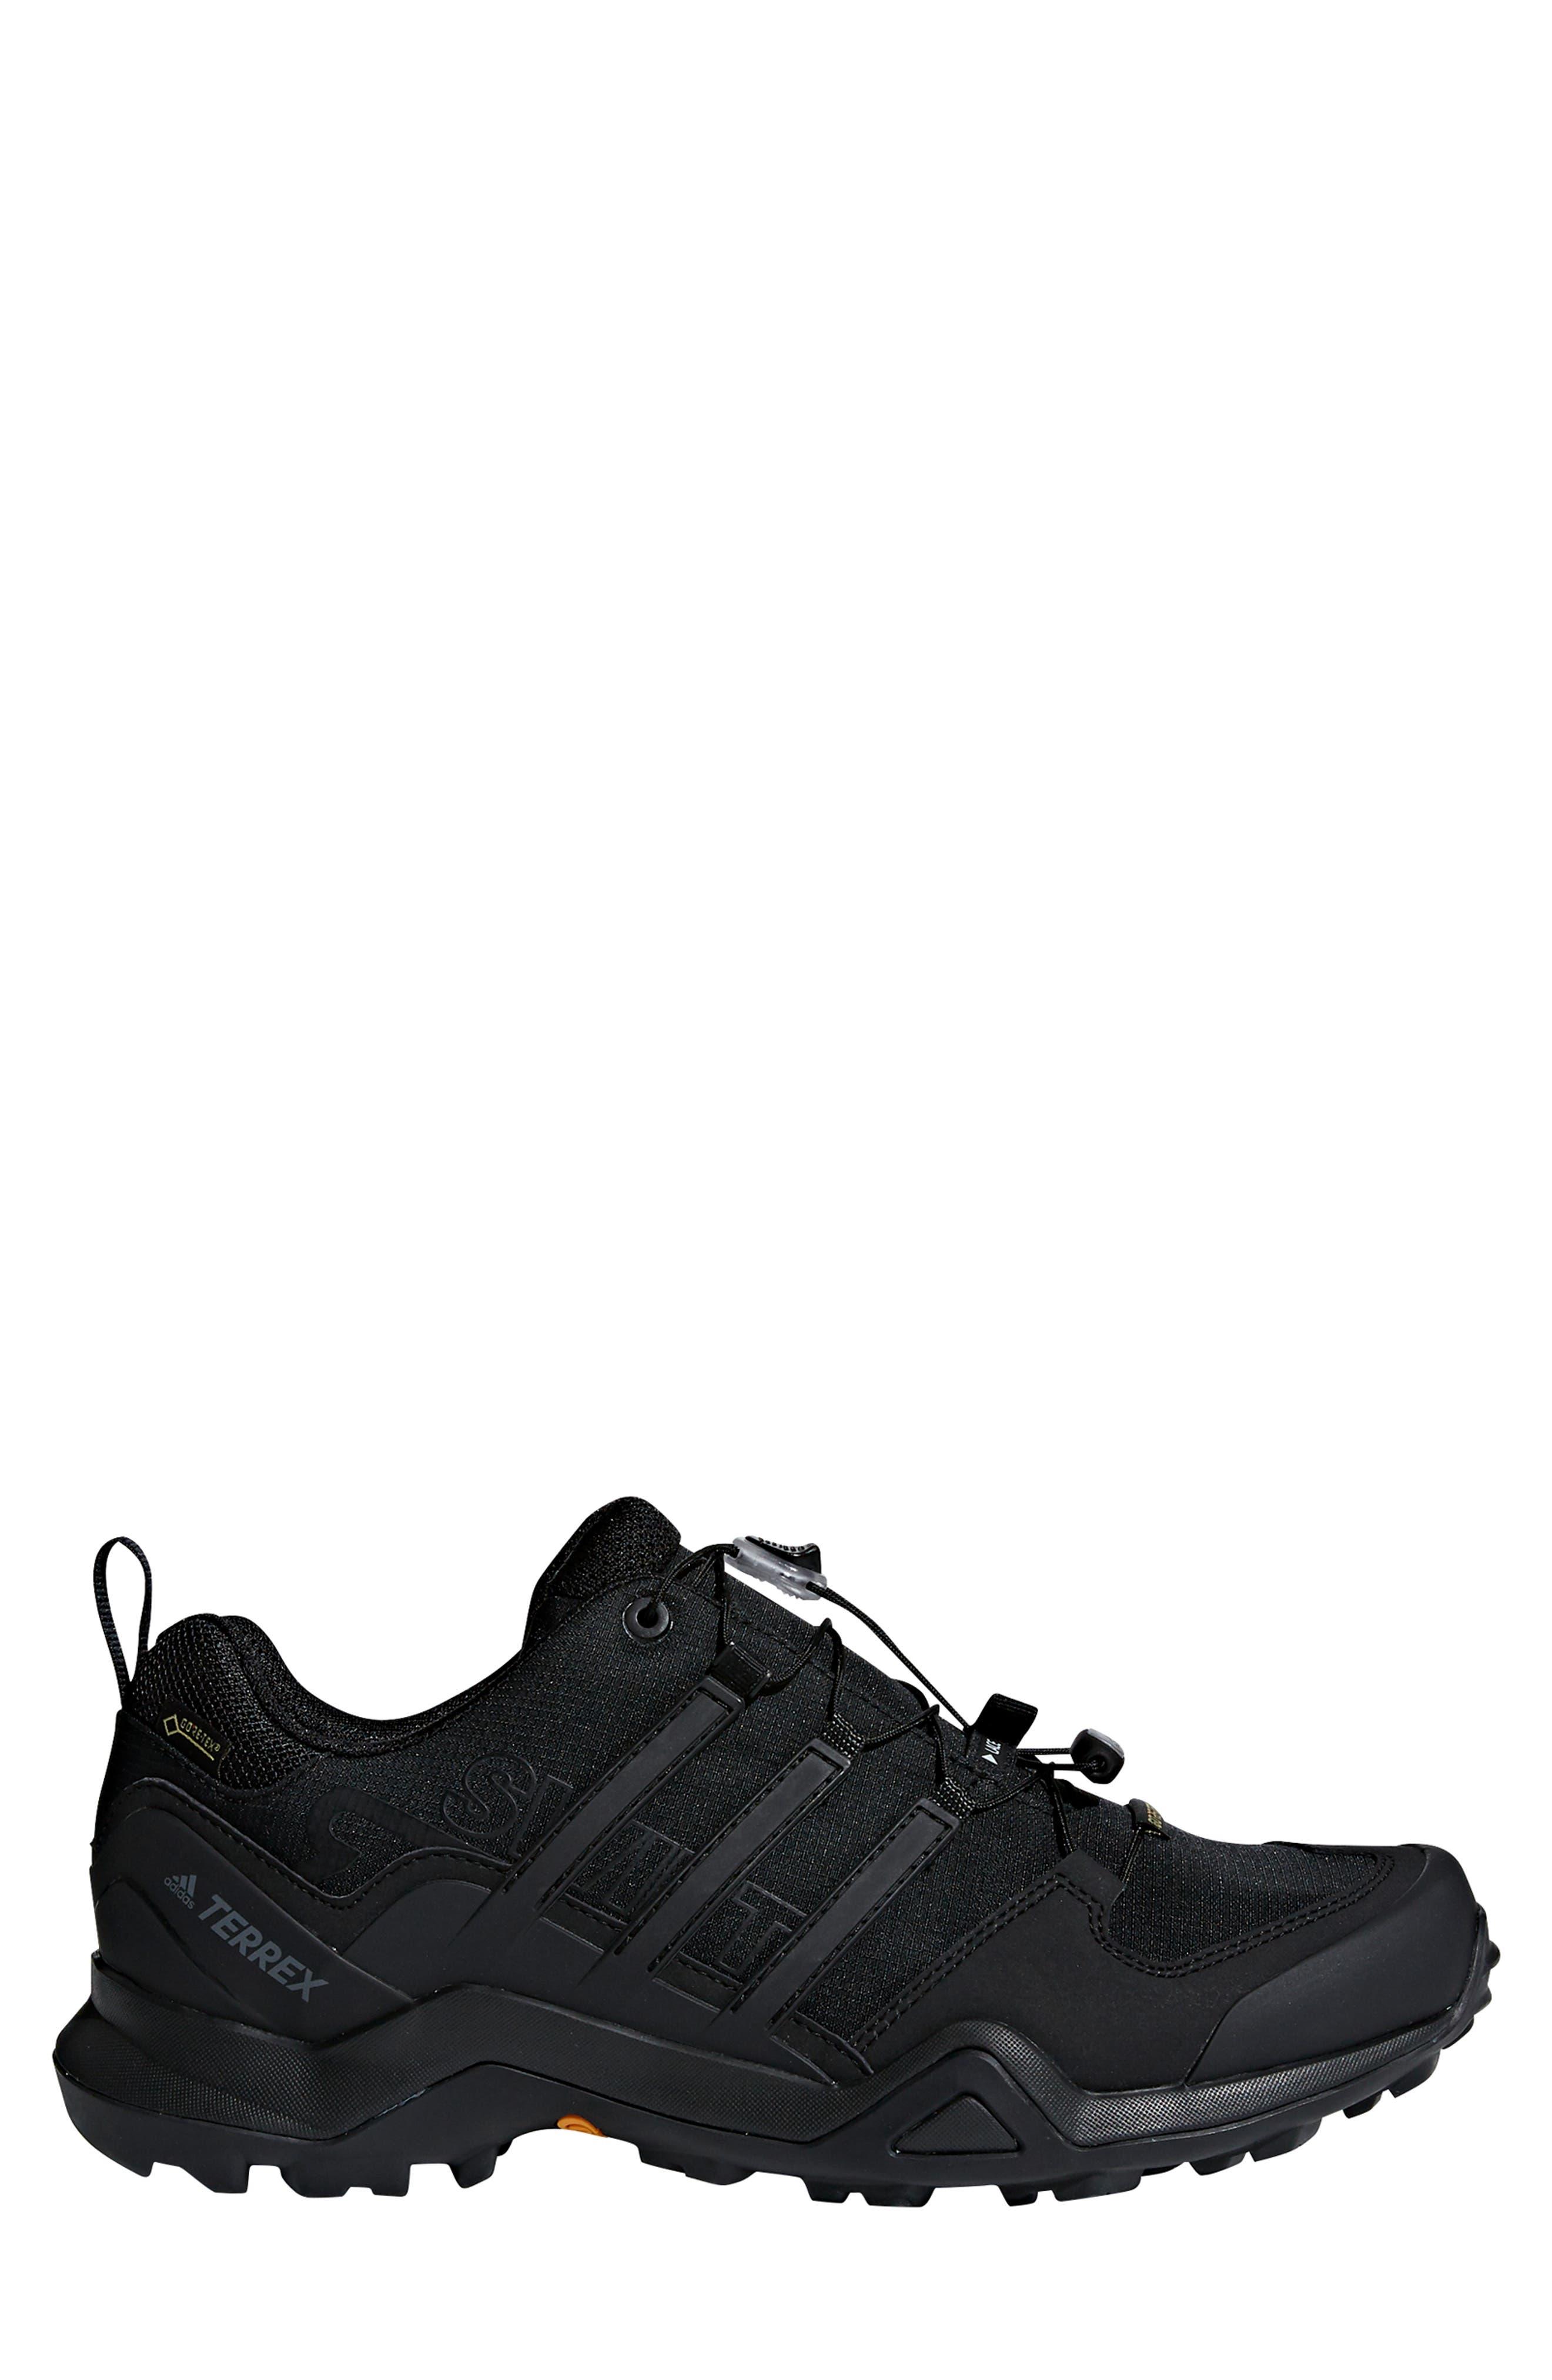 ADIDAS,                             Terrex Swift R2 GTX Gore-Tex<sup>®</sup> Waterproof Hiking Shoe,                             Alternate thumbnail 3, color,                             BLACK/ BLACK/ BLACK